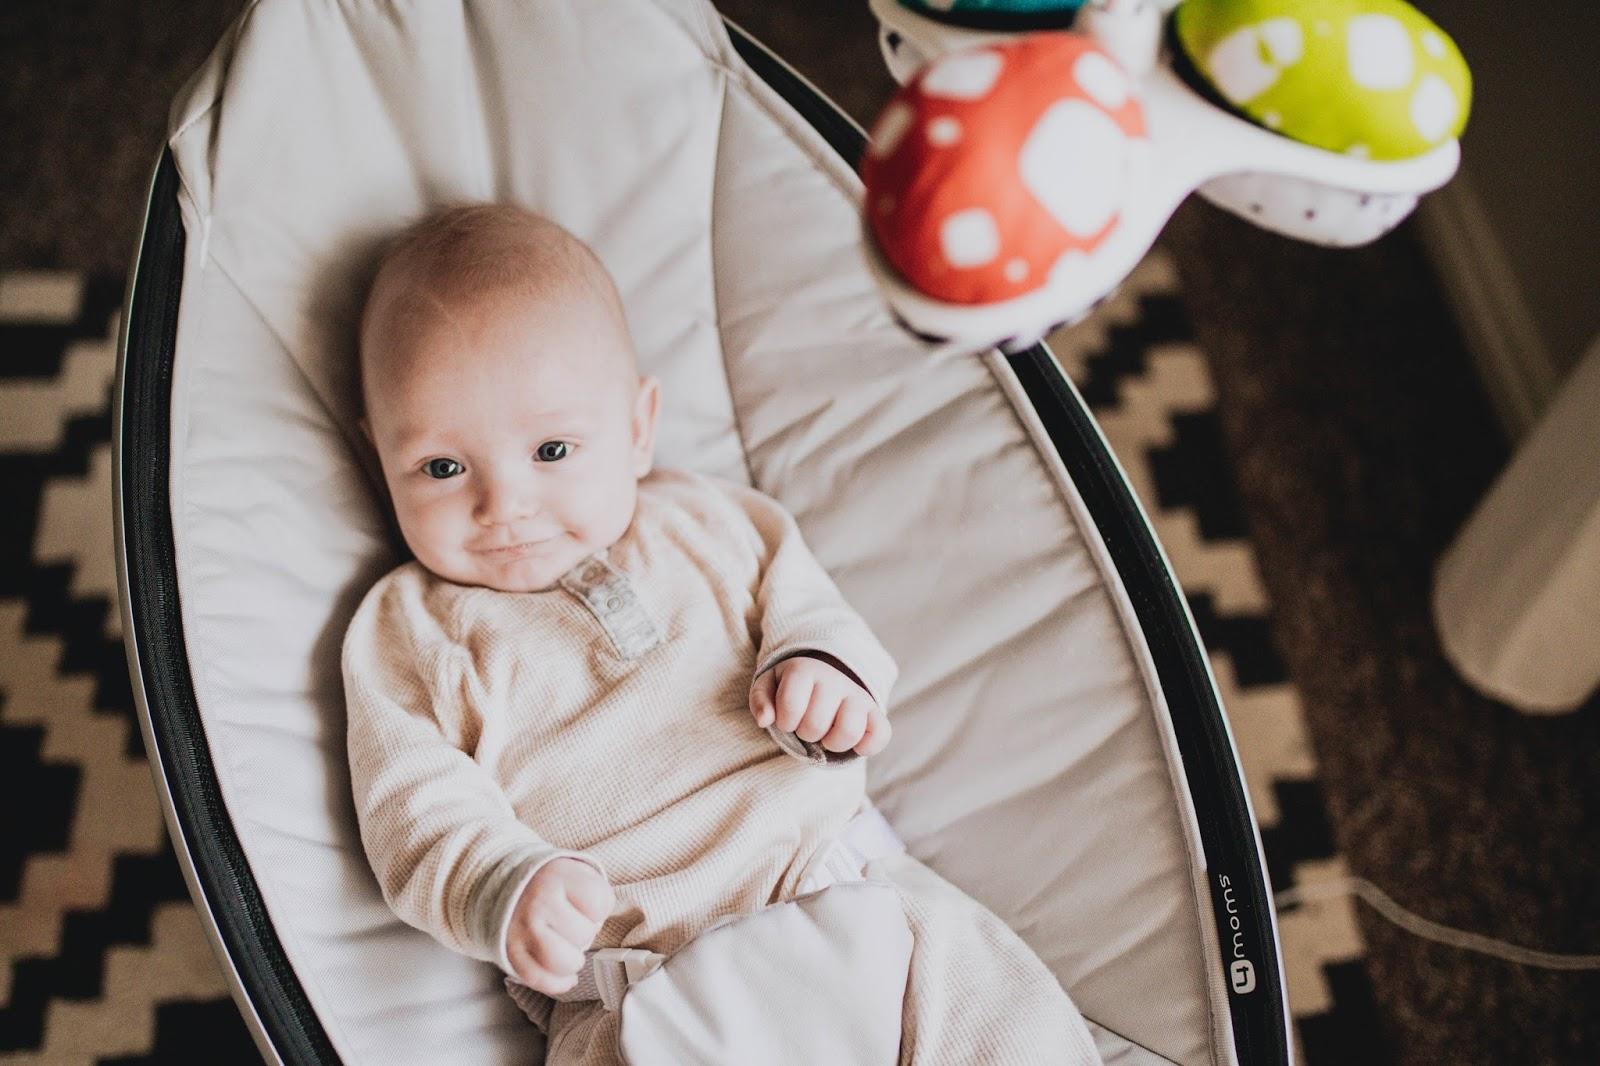 4moms Mamaroo Infant Seat Review Dearest Lou Bloglovin